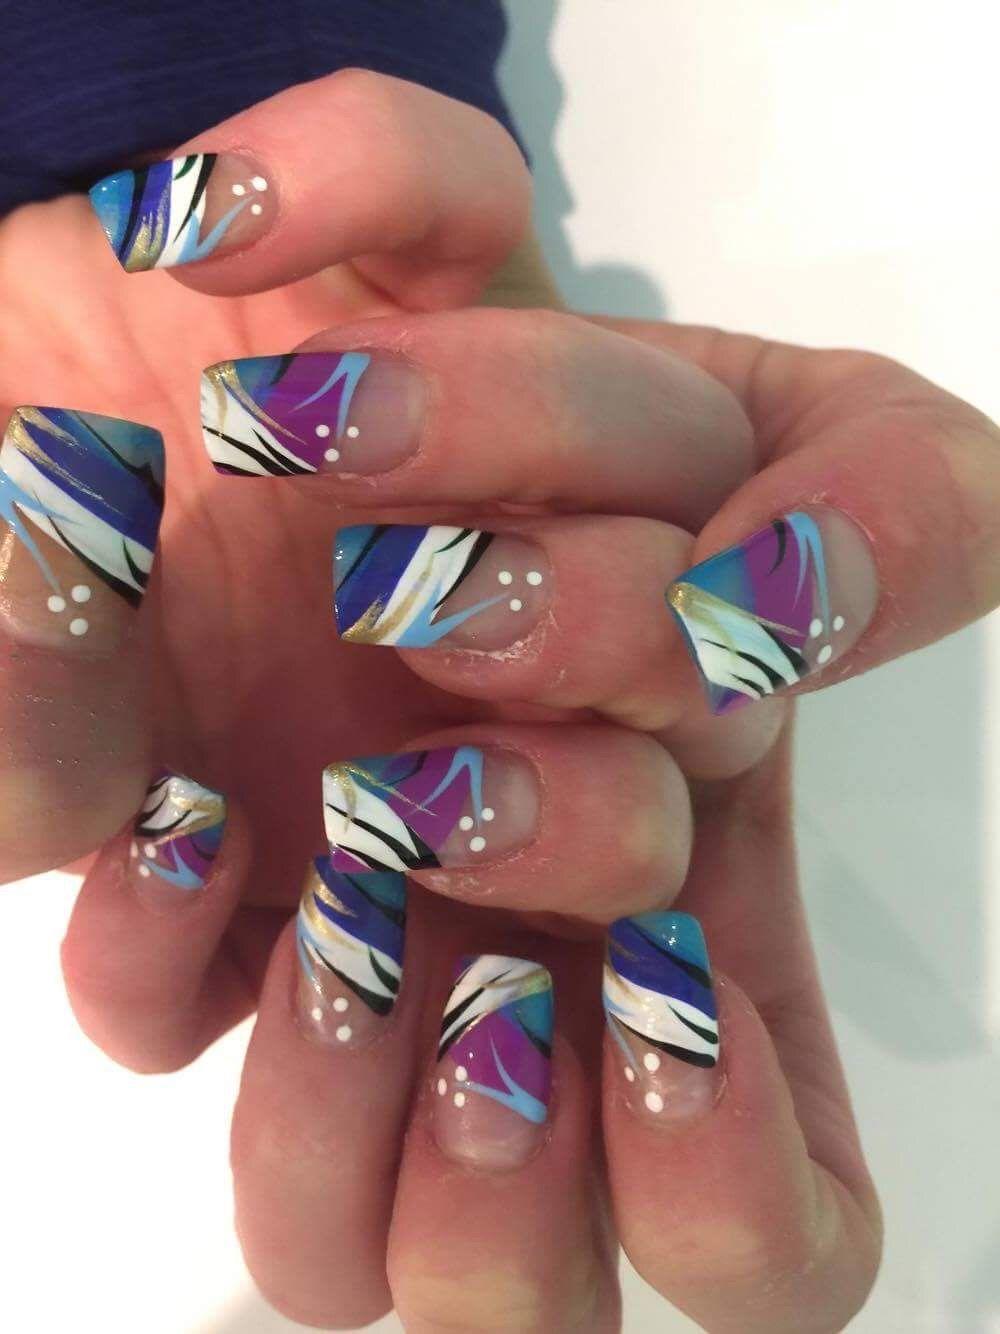 Pin by Marisa Moughan on My crazy nail designs | Pinterest ...